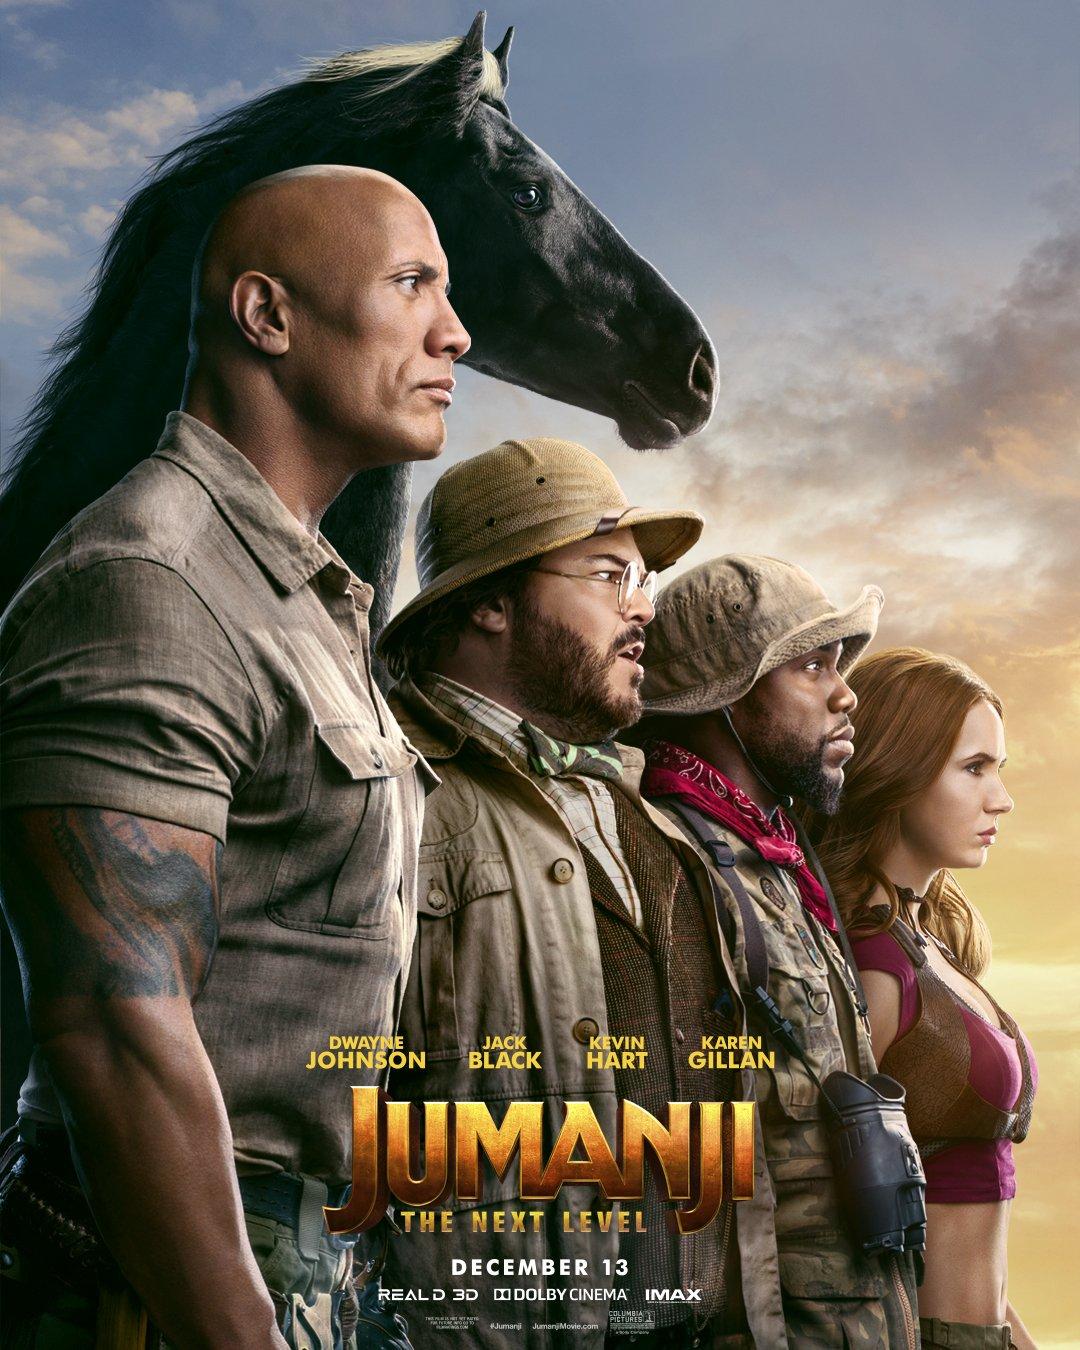 Jumanji The Next Level Trailer 2 & Poster 1